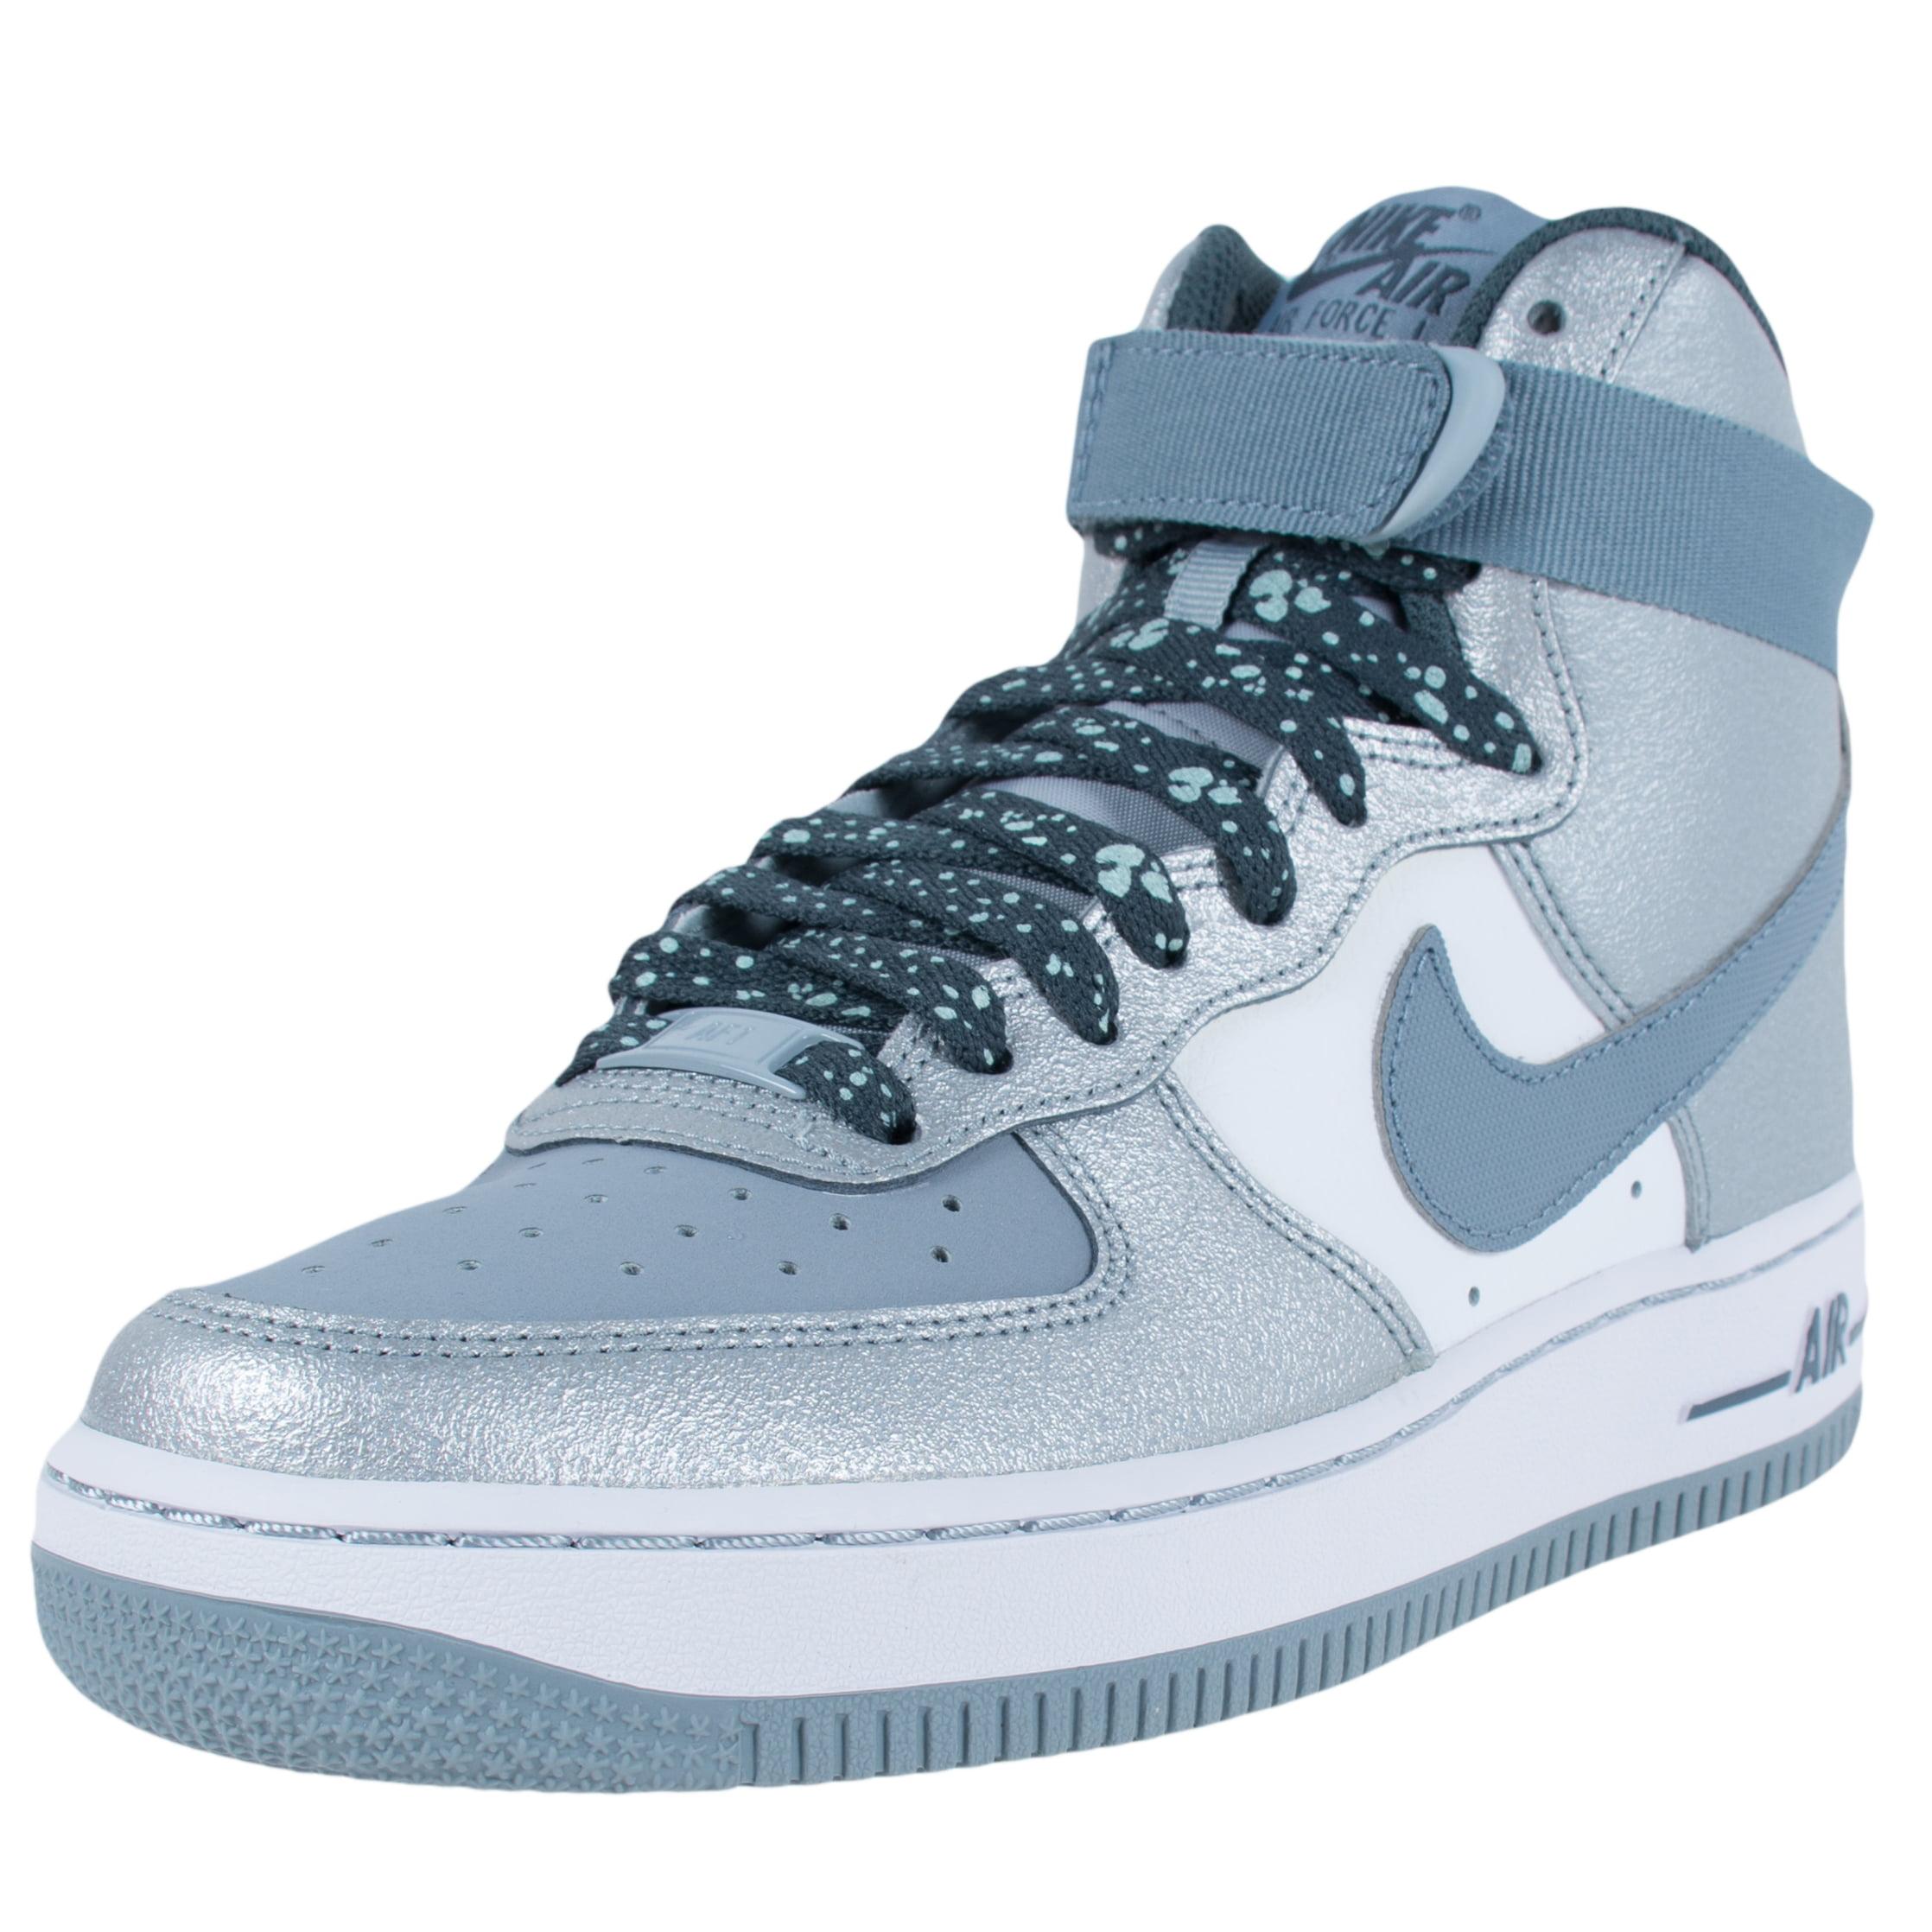 Nike Air Force 1 High Light Magnet Grey